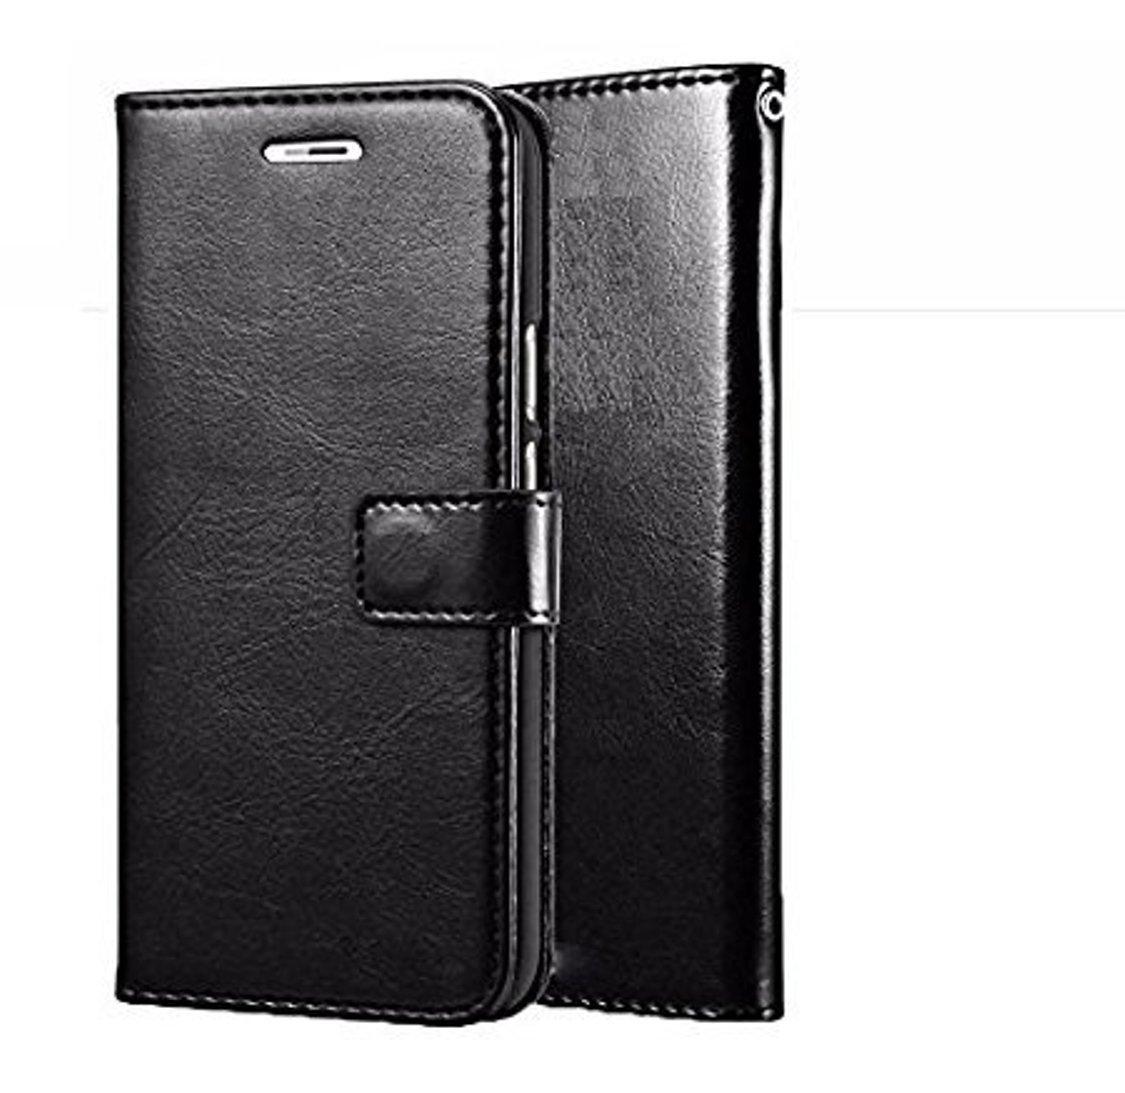 D G Kases Vintage Pu Leather Kickstand Wallet Flip Case Cover For Oneplus 6   Black